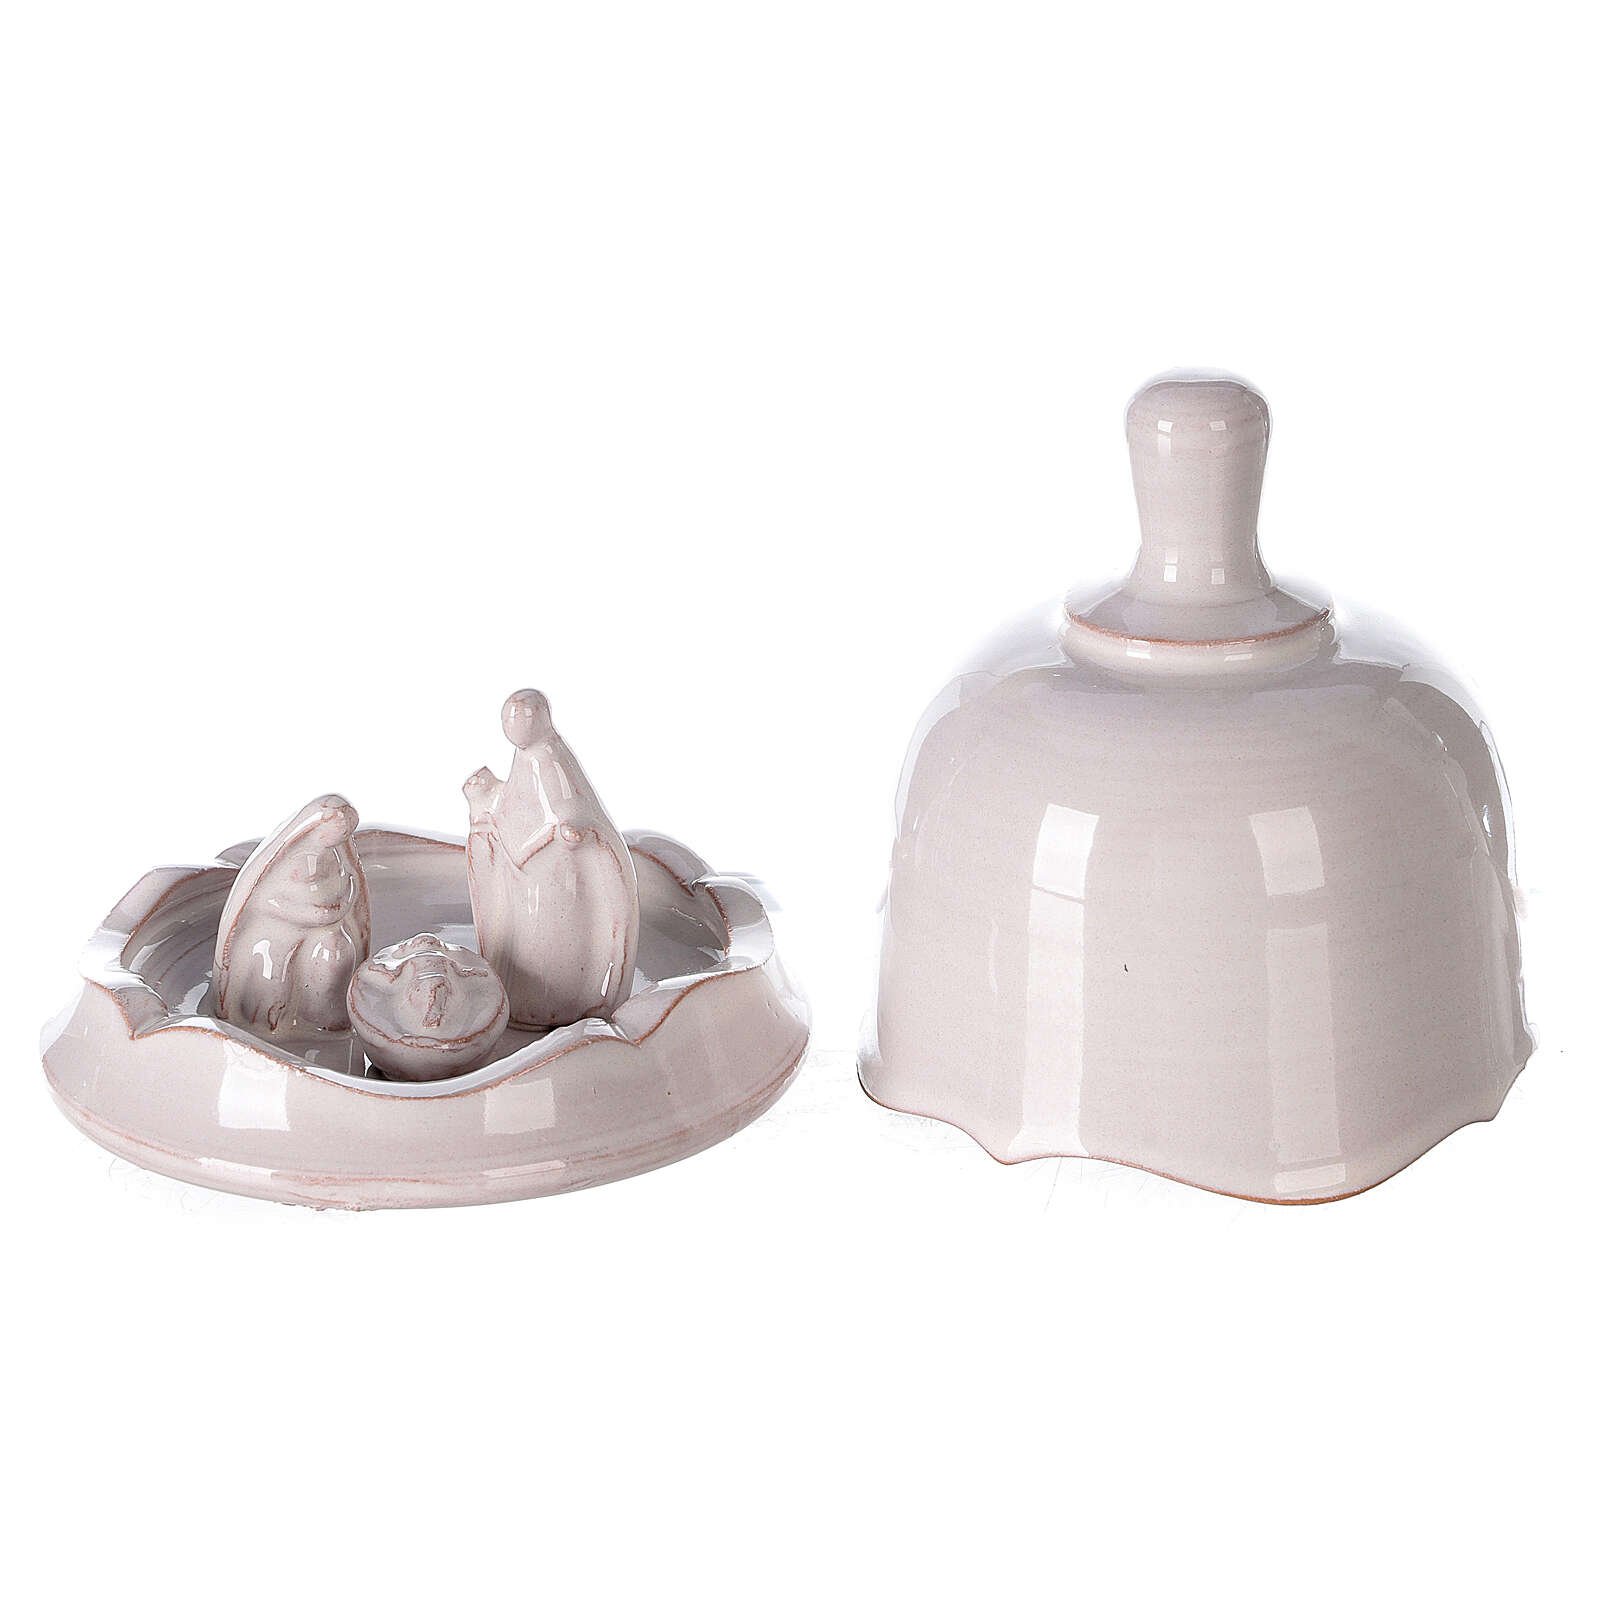 Presepe campanella apribile bianca terracotta Deruta 10 cm 4